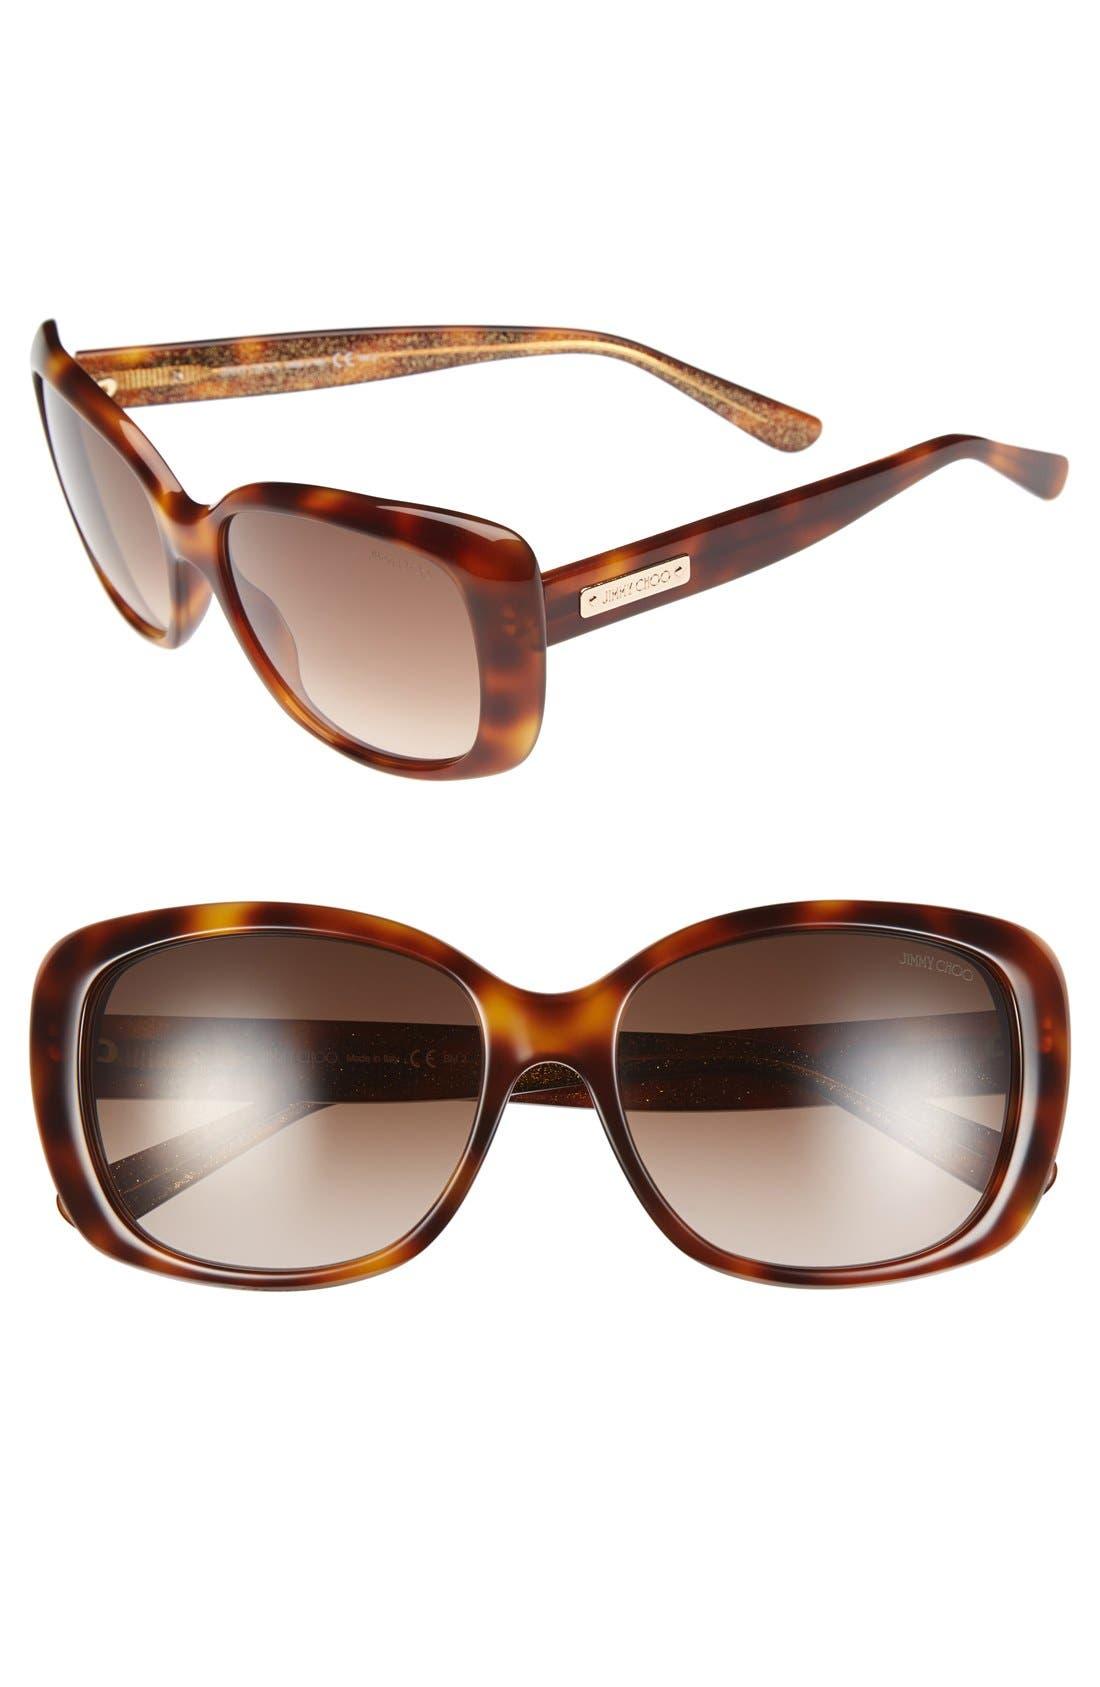 56mm Sunglasses,                         Main,                         color, HAVANA